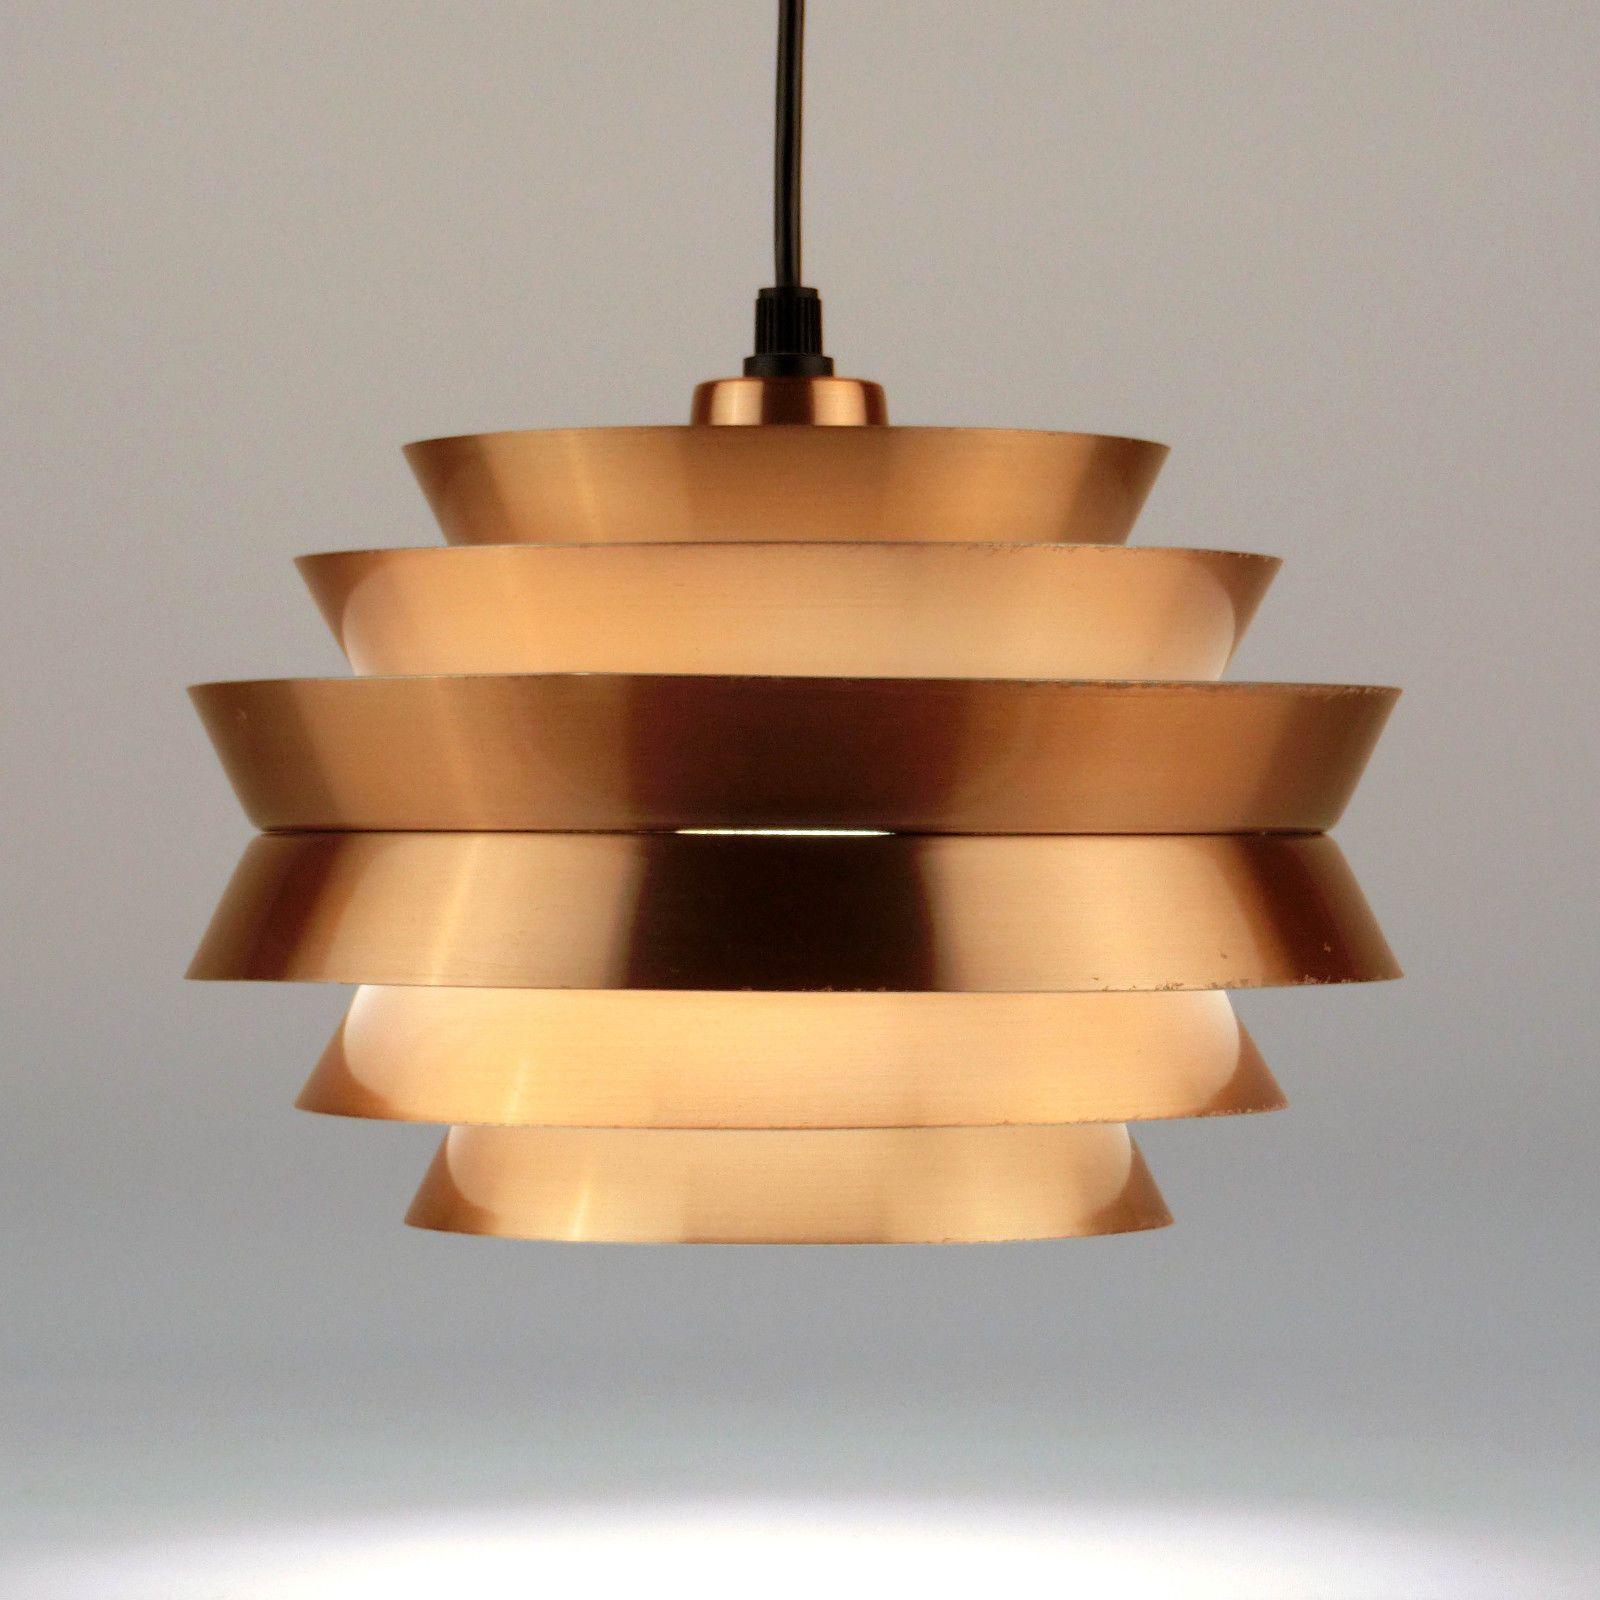 Danish Modern Pendant Hanging Lamp FOG MORUP Carl Thore Copper Vintage 1960s